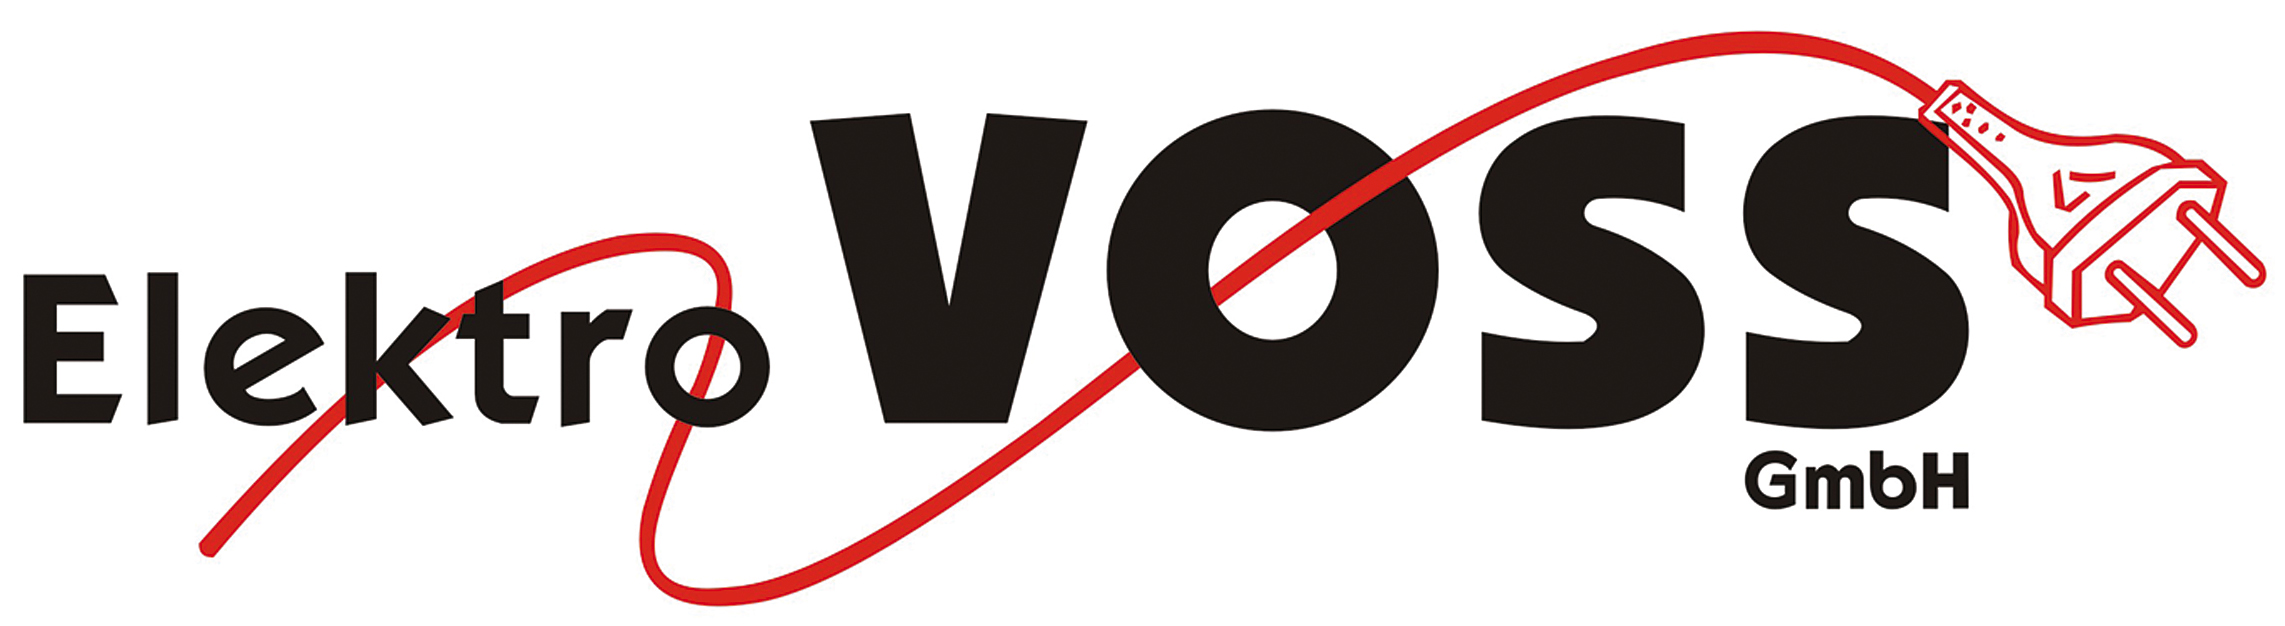 Elektro Voss GmbH